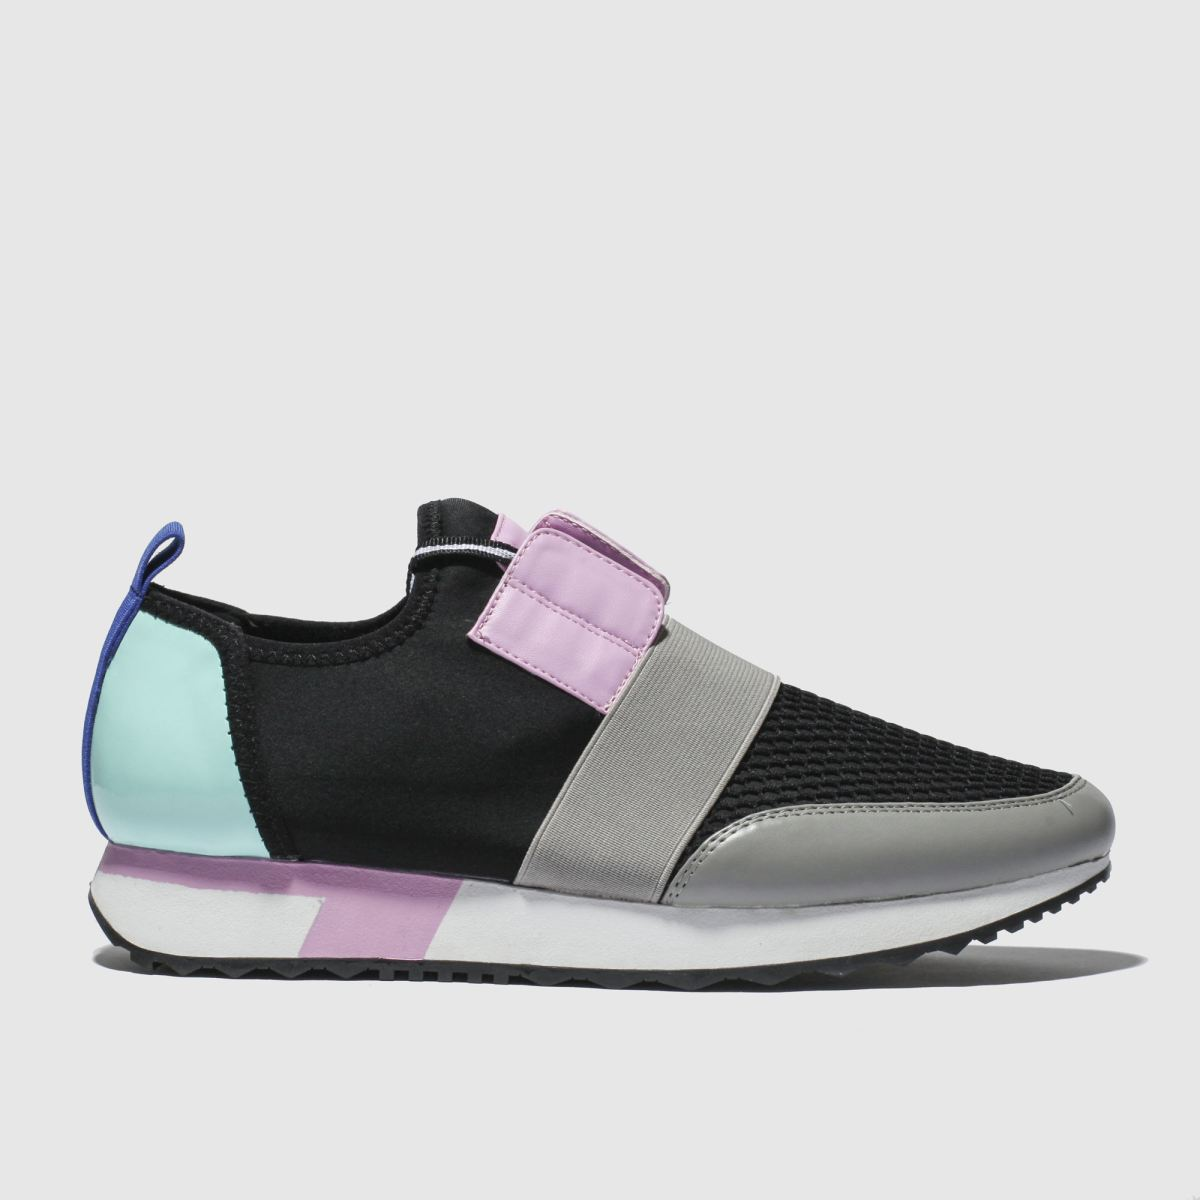 Schuh Black \u0026 Pink Finesse Flat Shoes